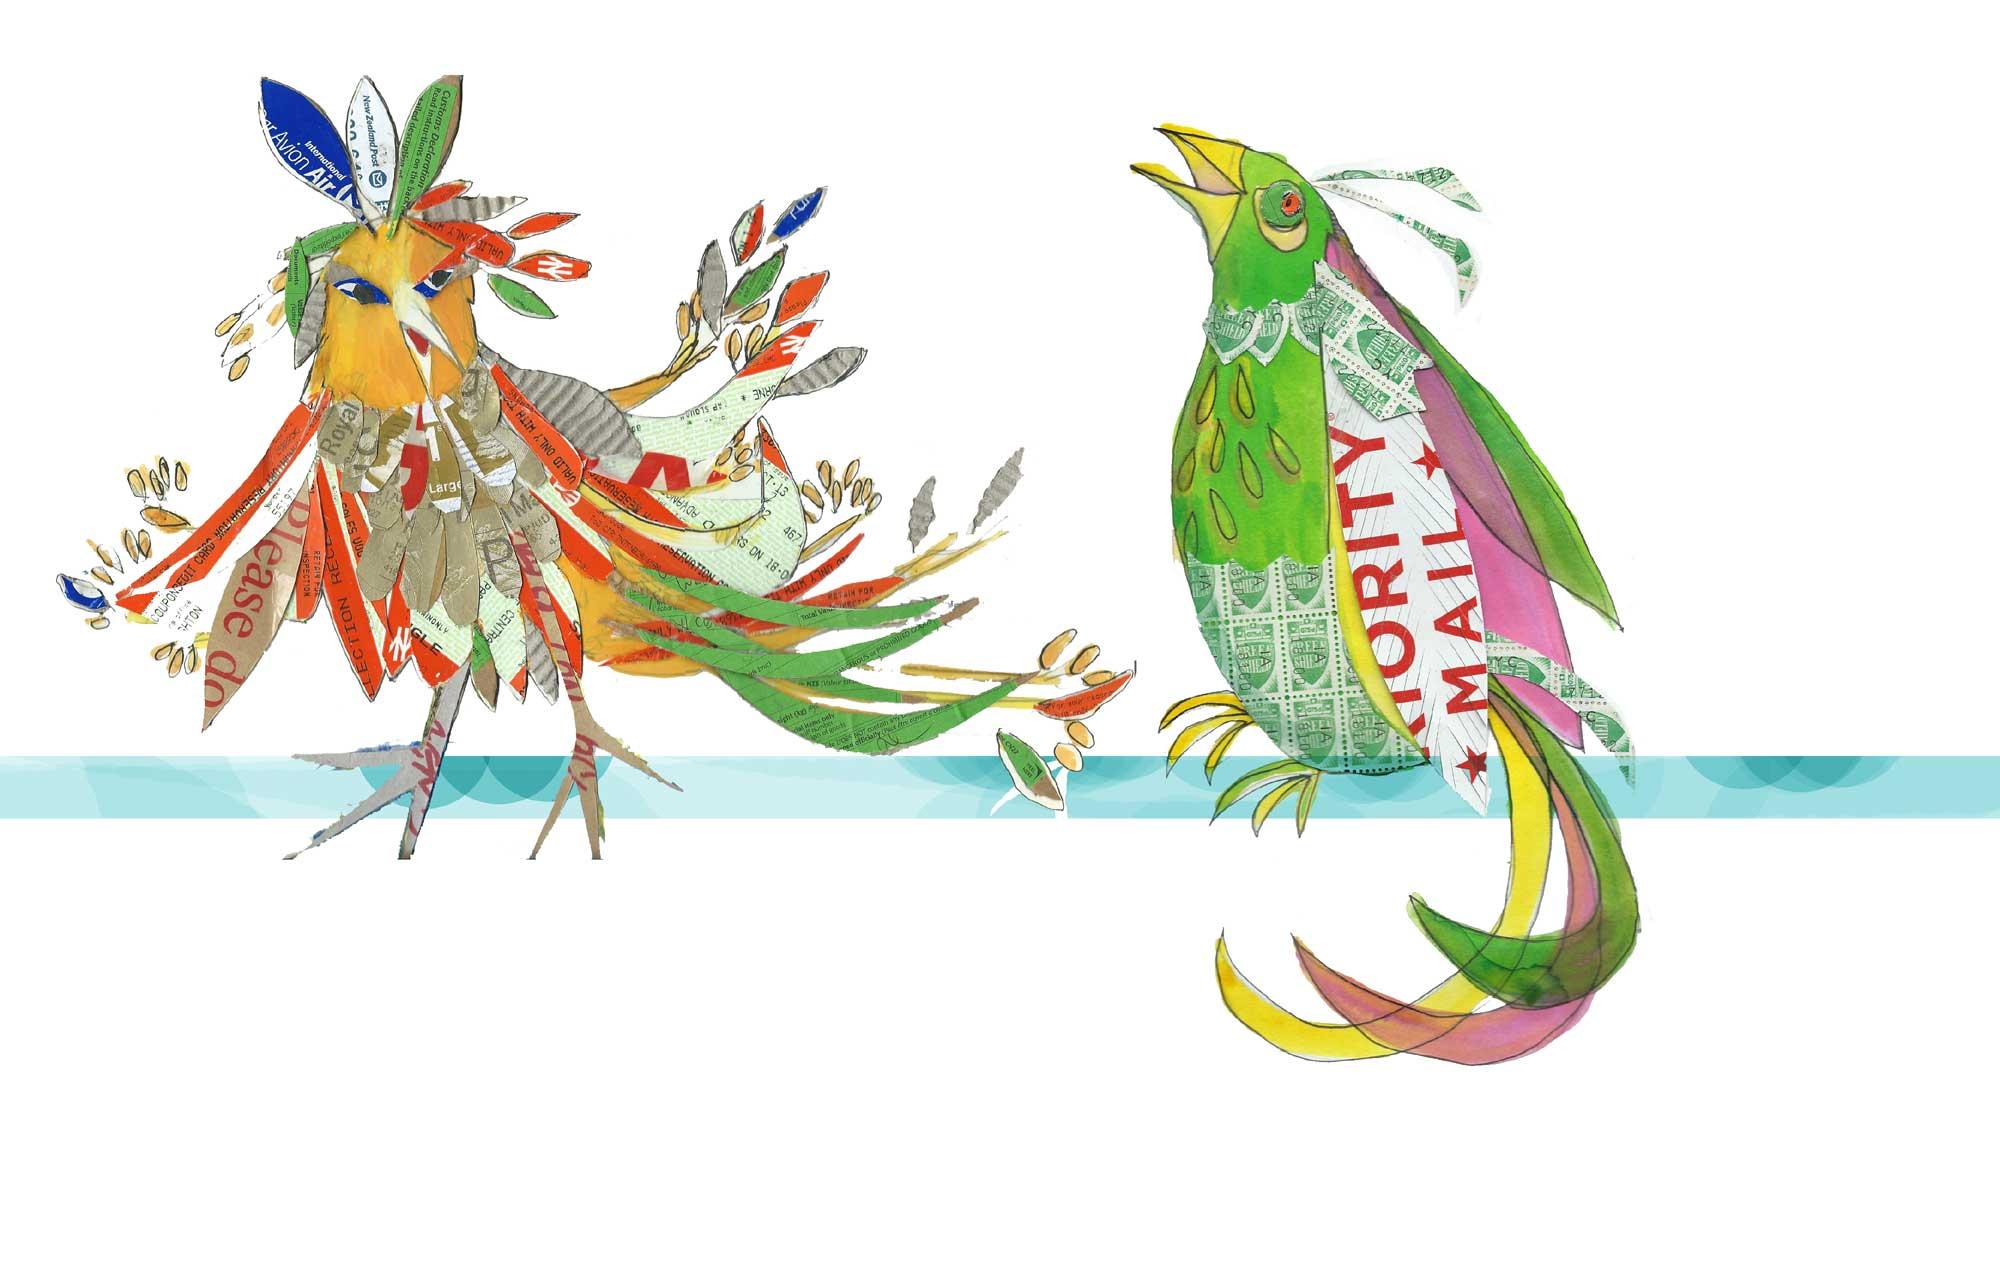 stampbirds by Myfanwy Tristram